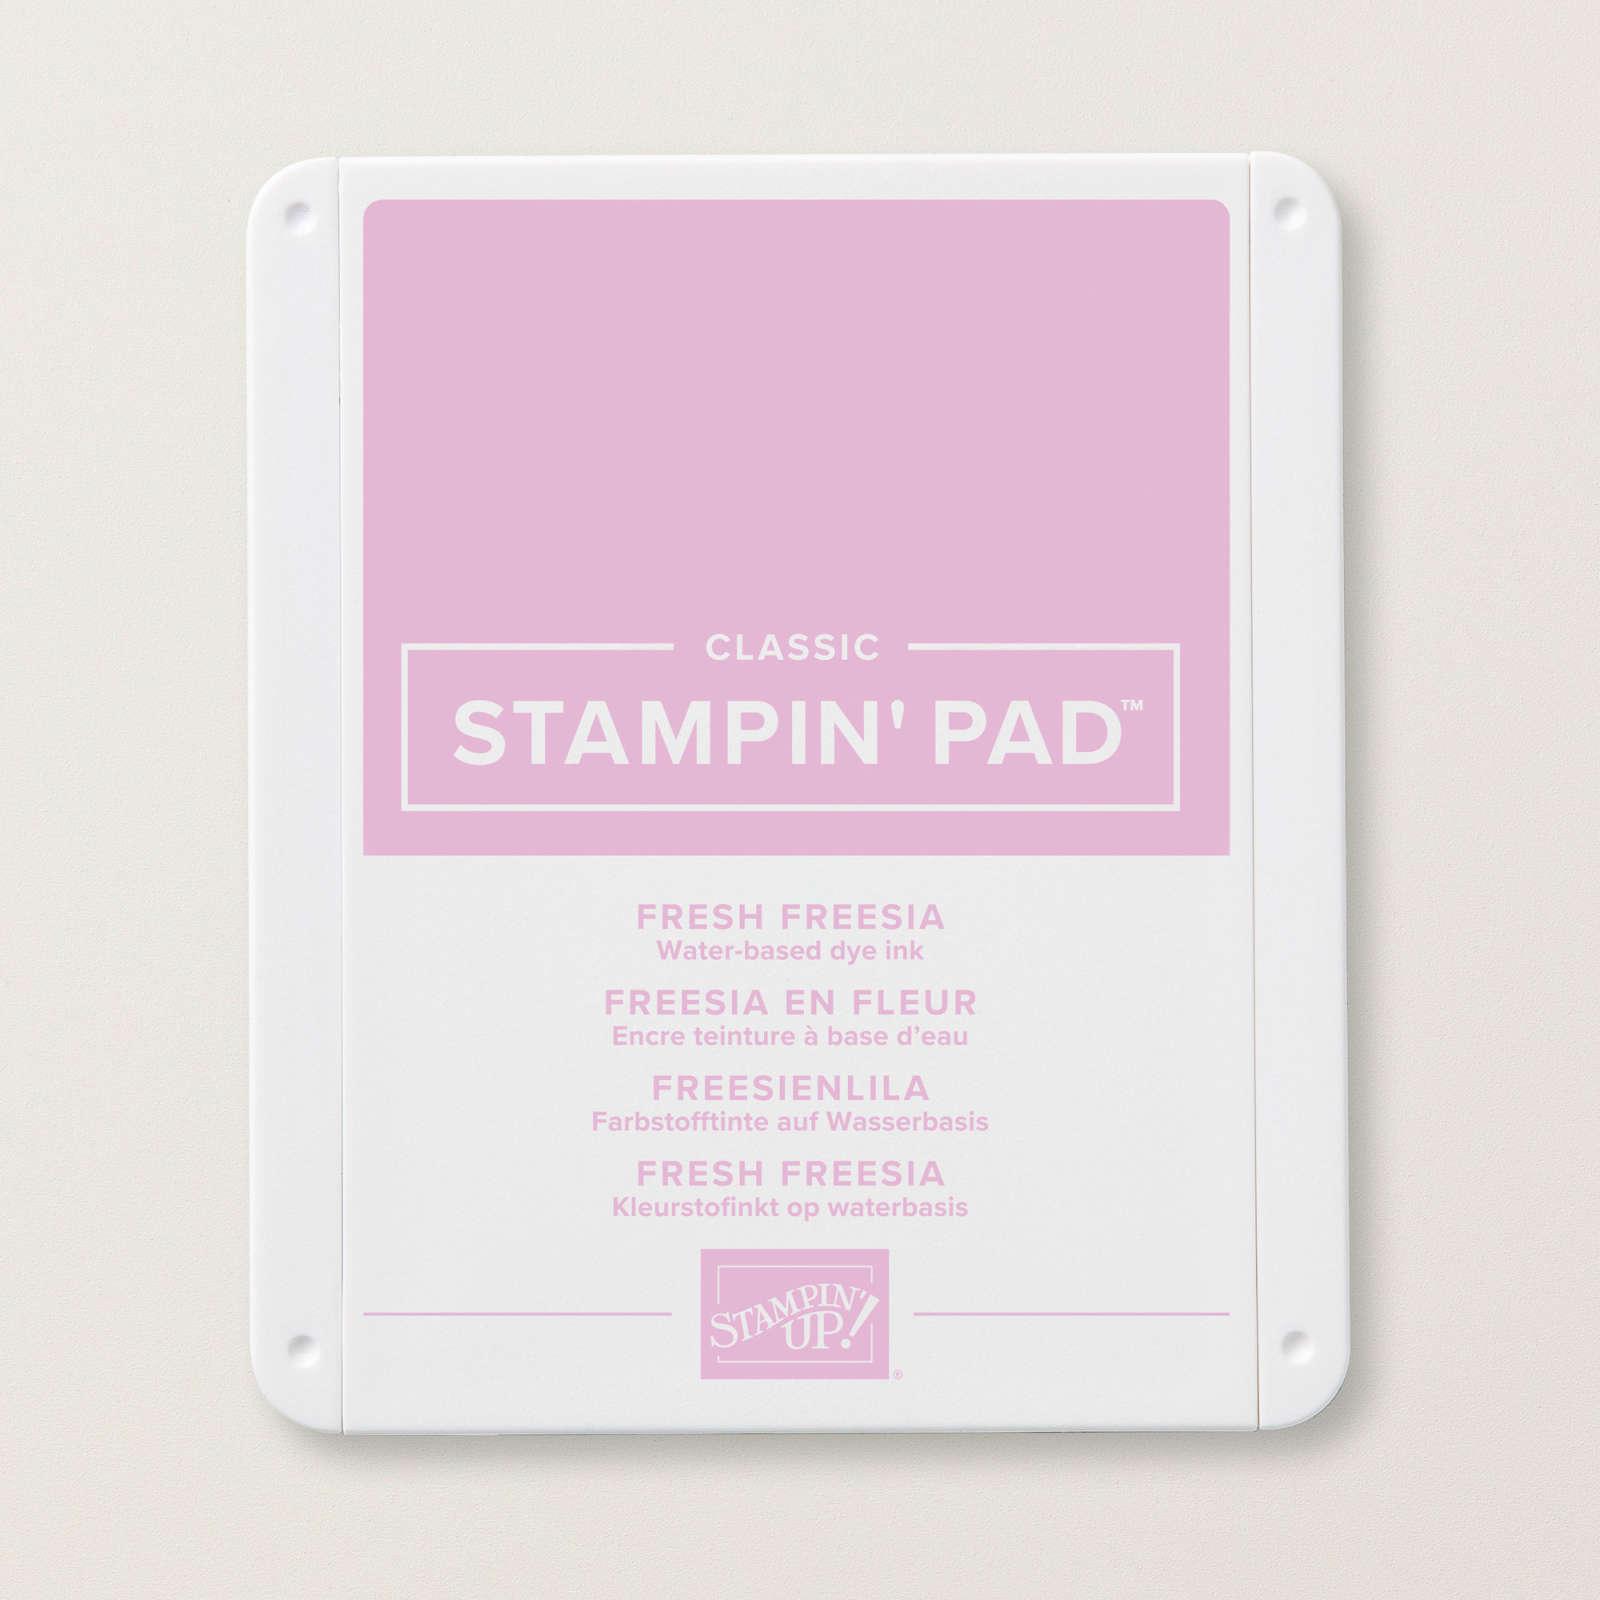 Fresh Freesia Classic Stampin' Pad